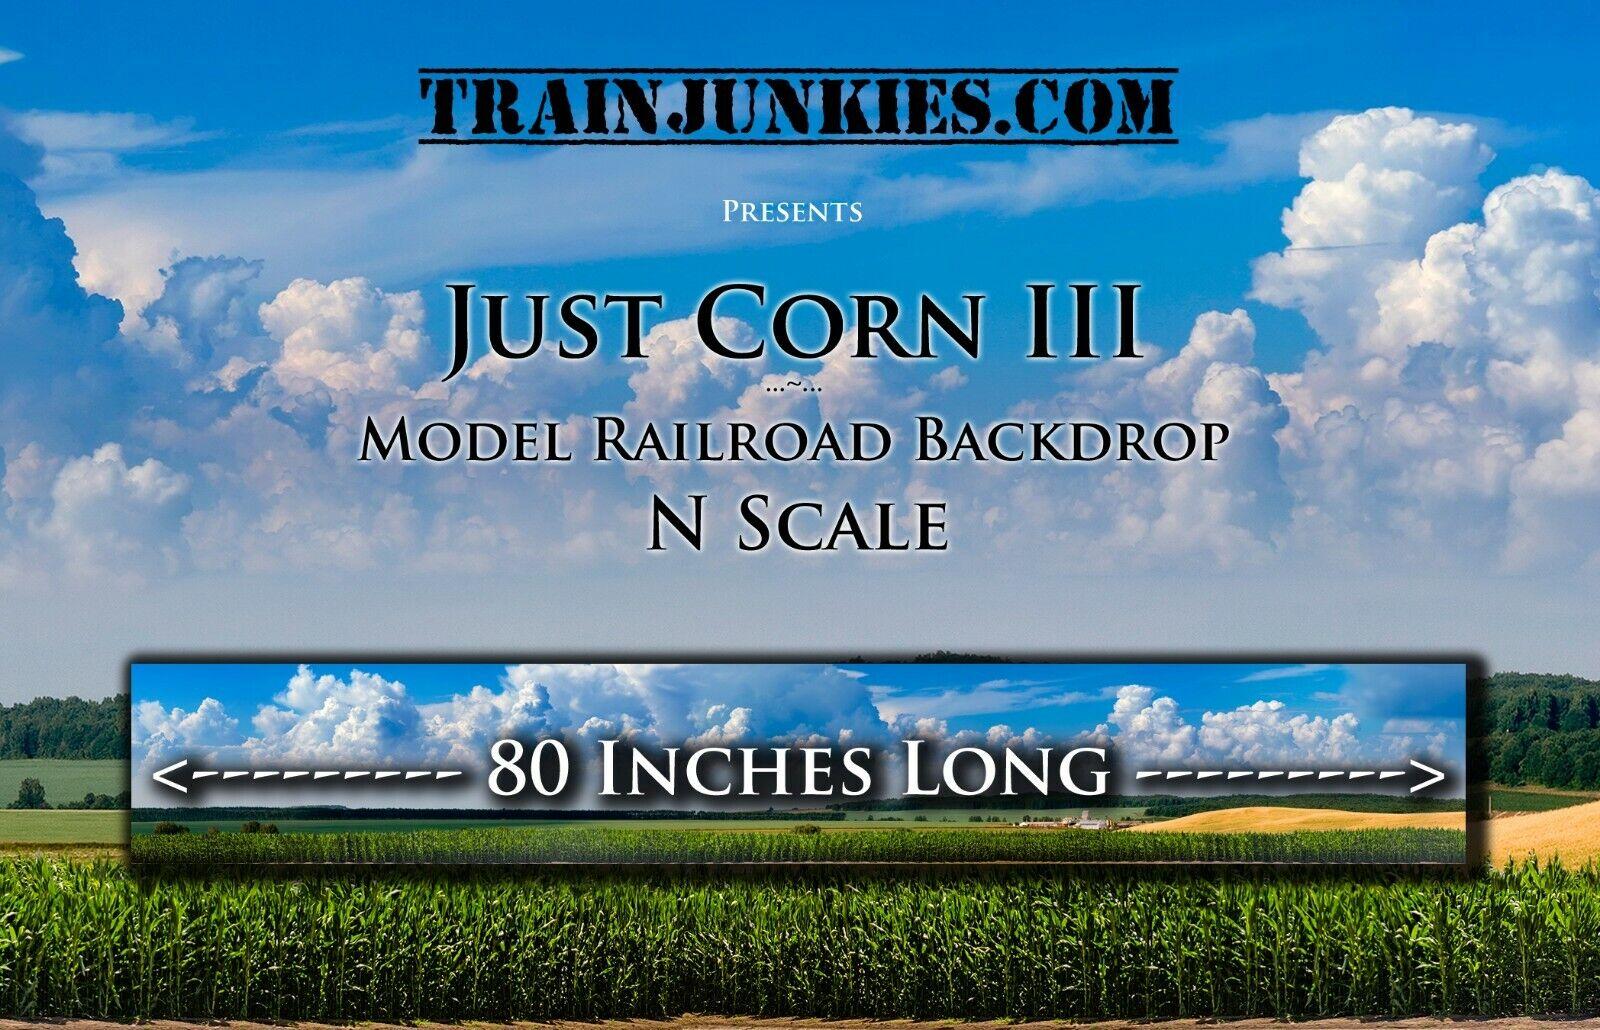 Train Junkies N Scale Just Corn III modellolo Railstrada Backdrop 12x80